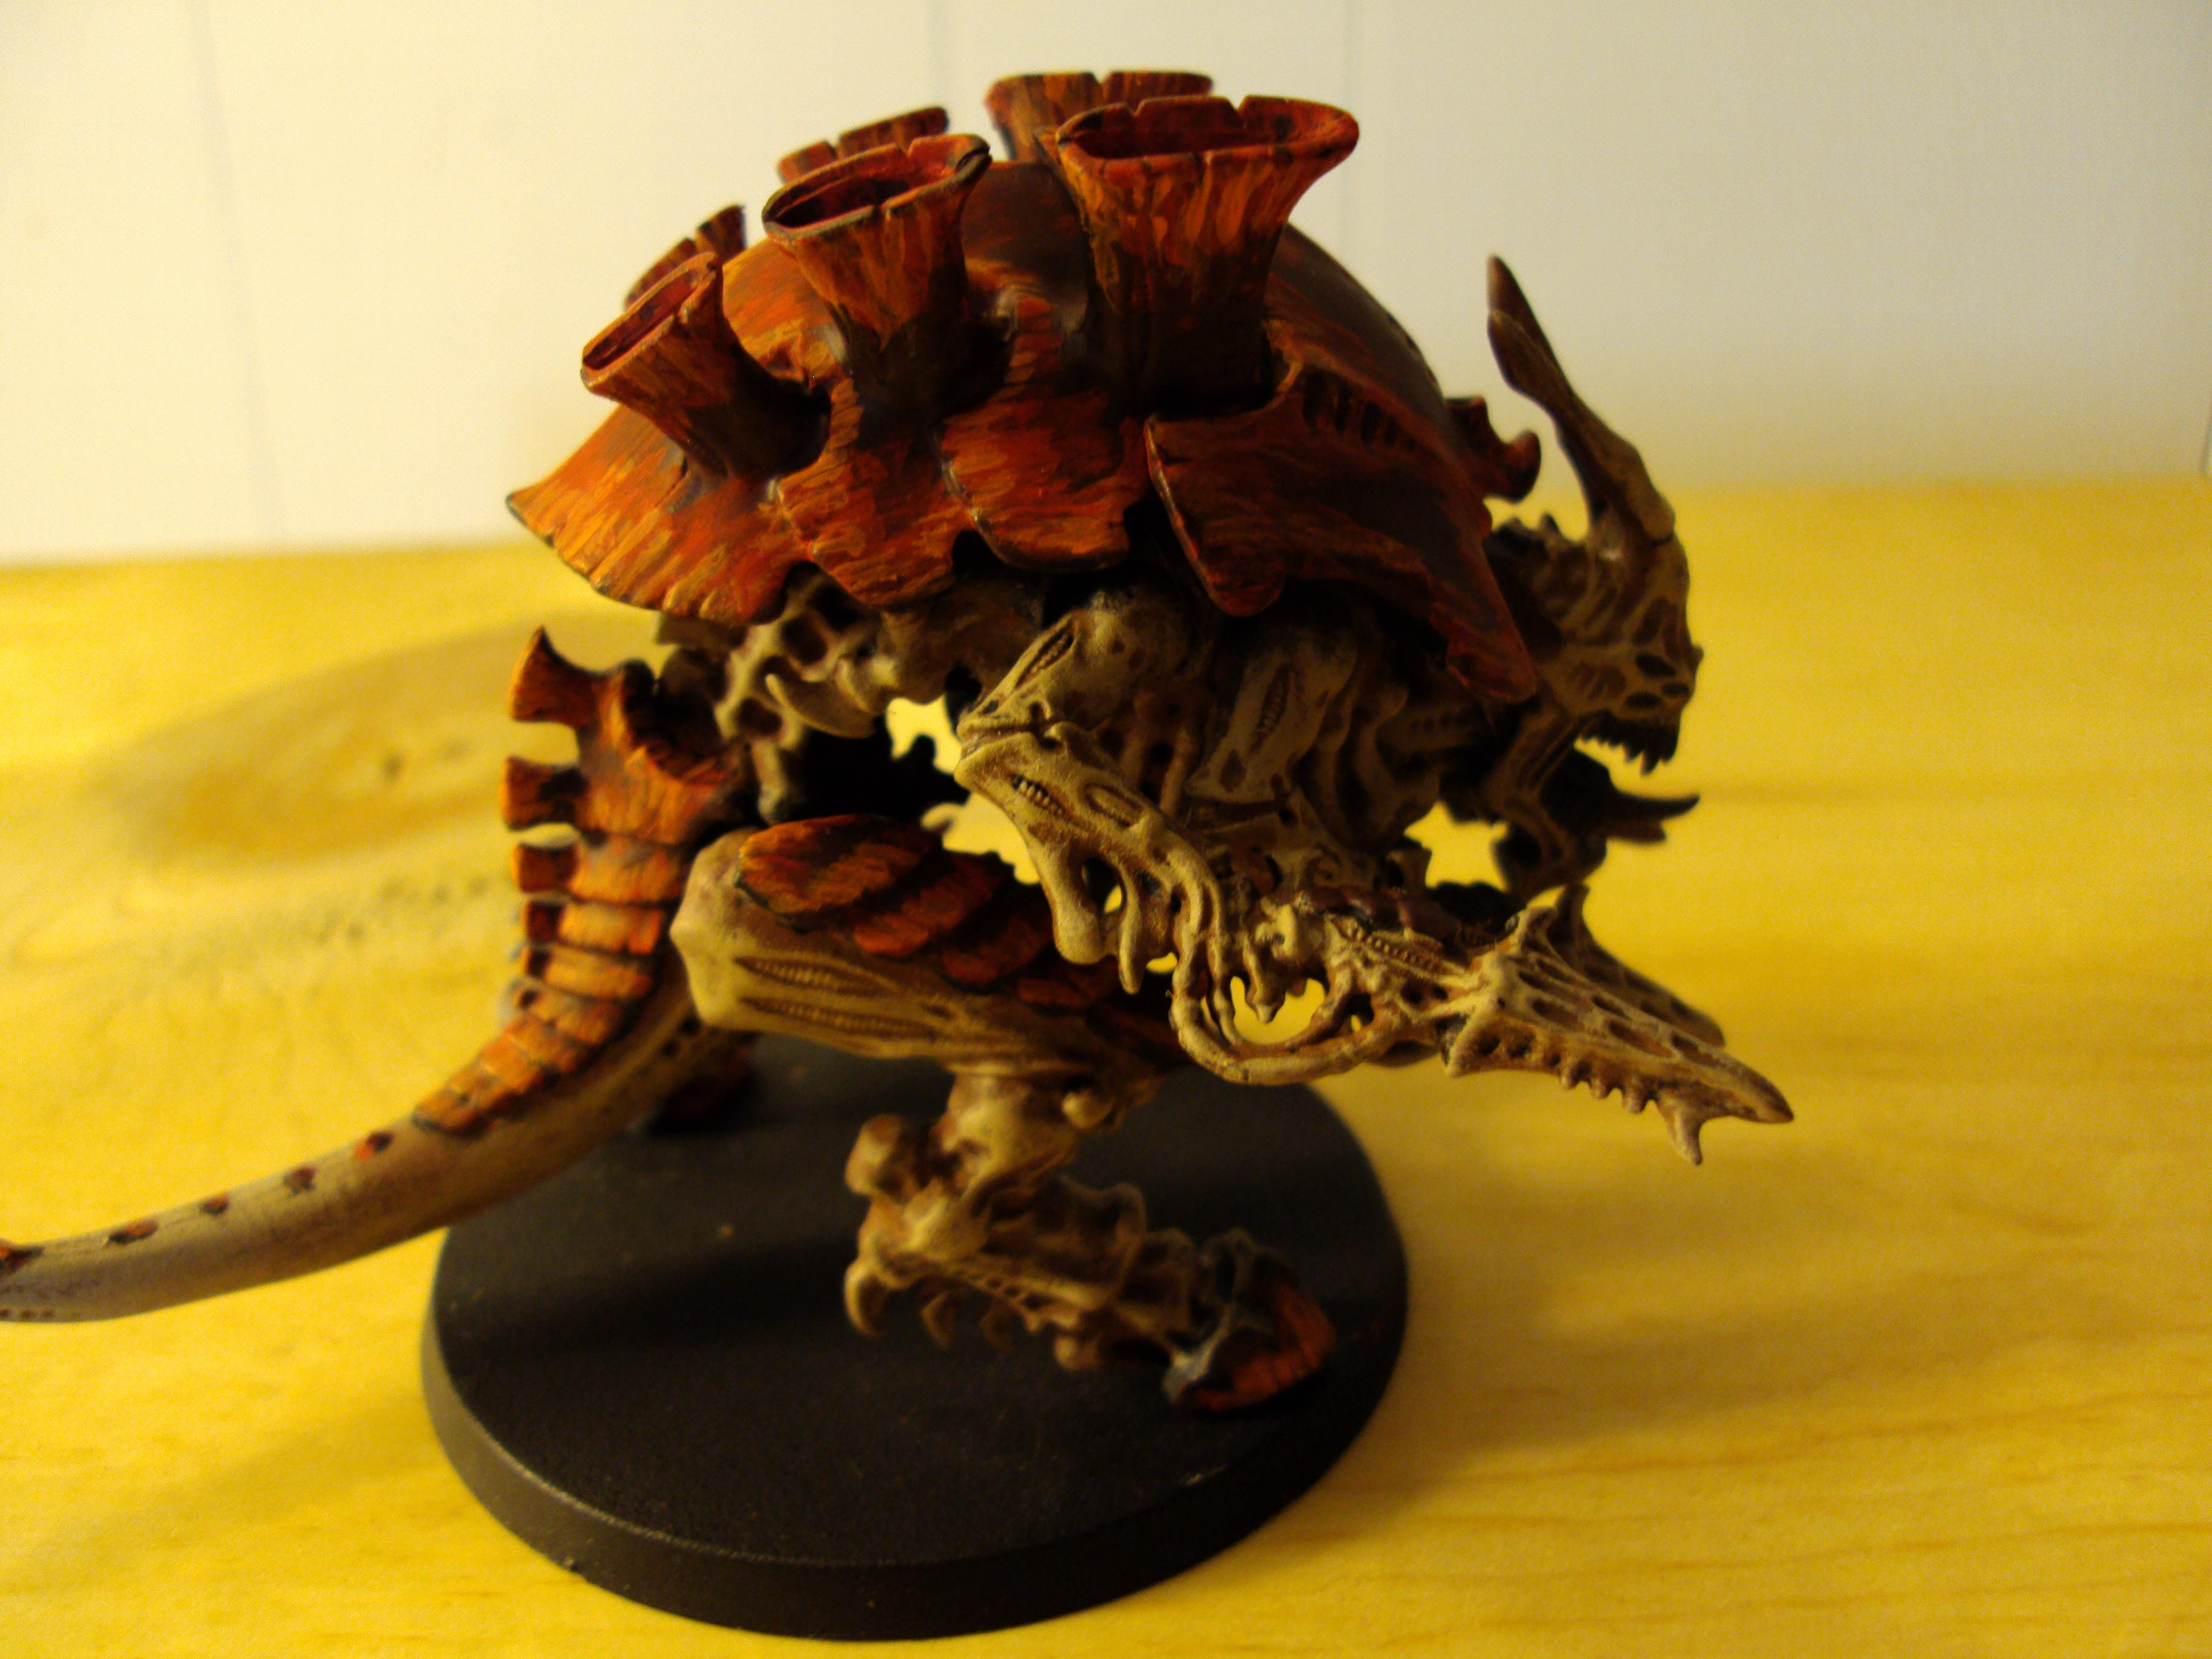 Carnifex, Dakkafex, Hive Fleet Kraken, Tyranids, Warhammer 40,000